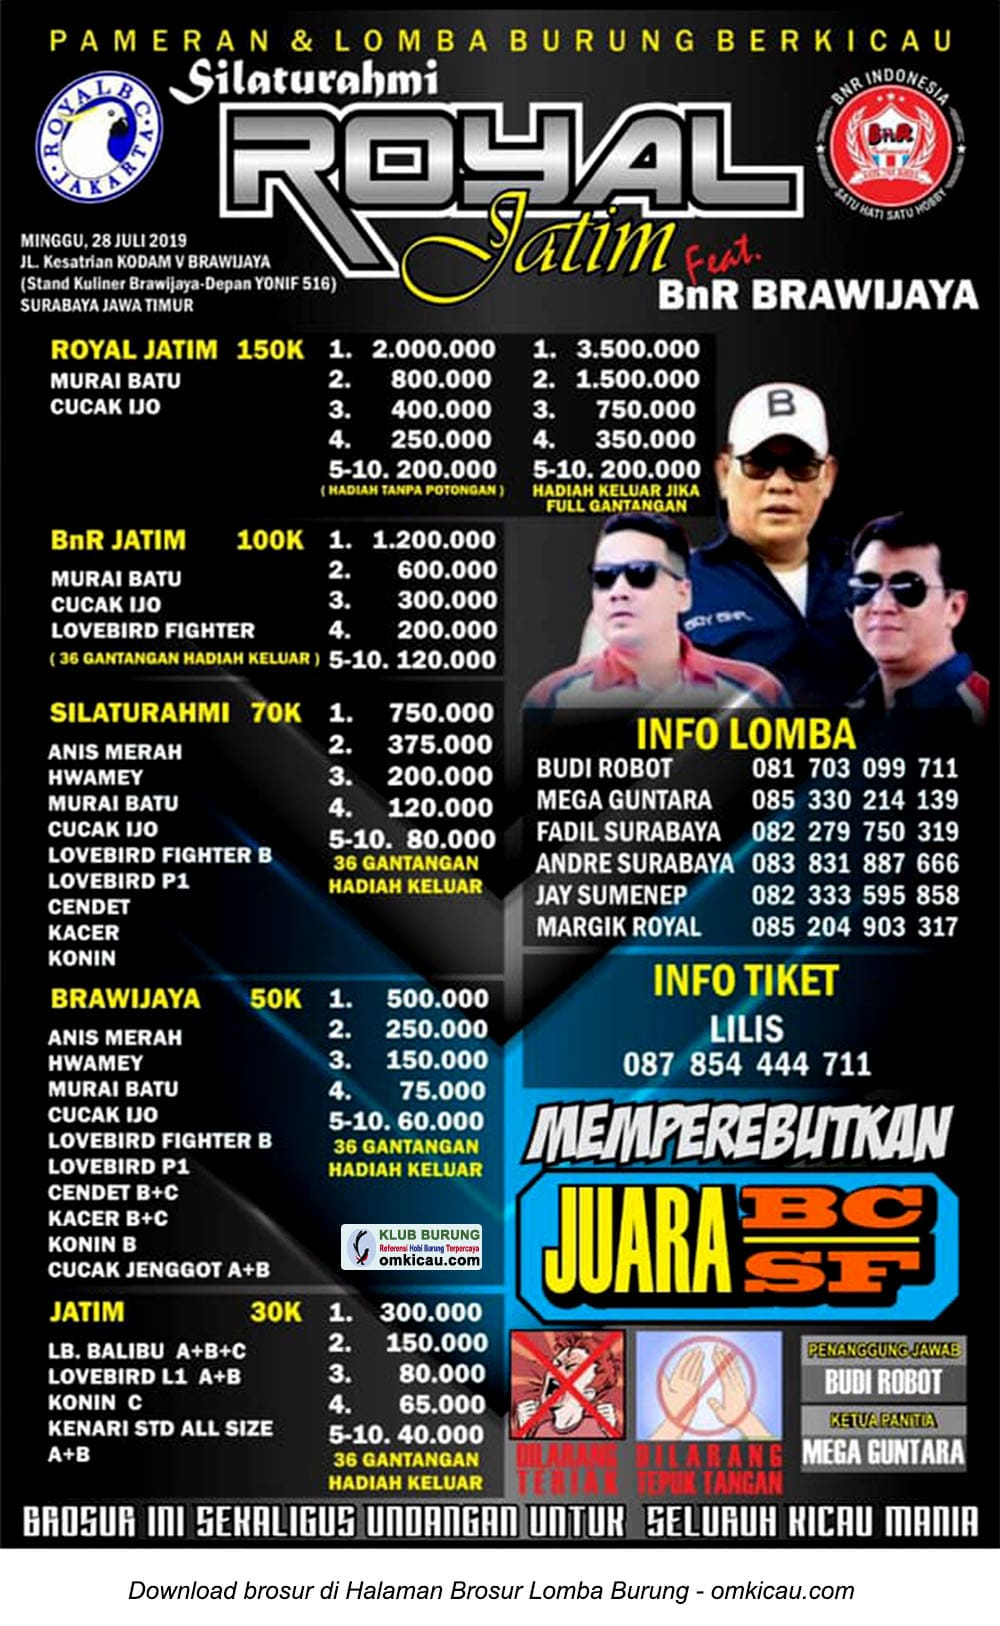 Silaturahmi Royal Jatim feat BnR Brawijaya